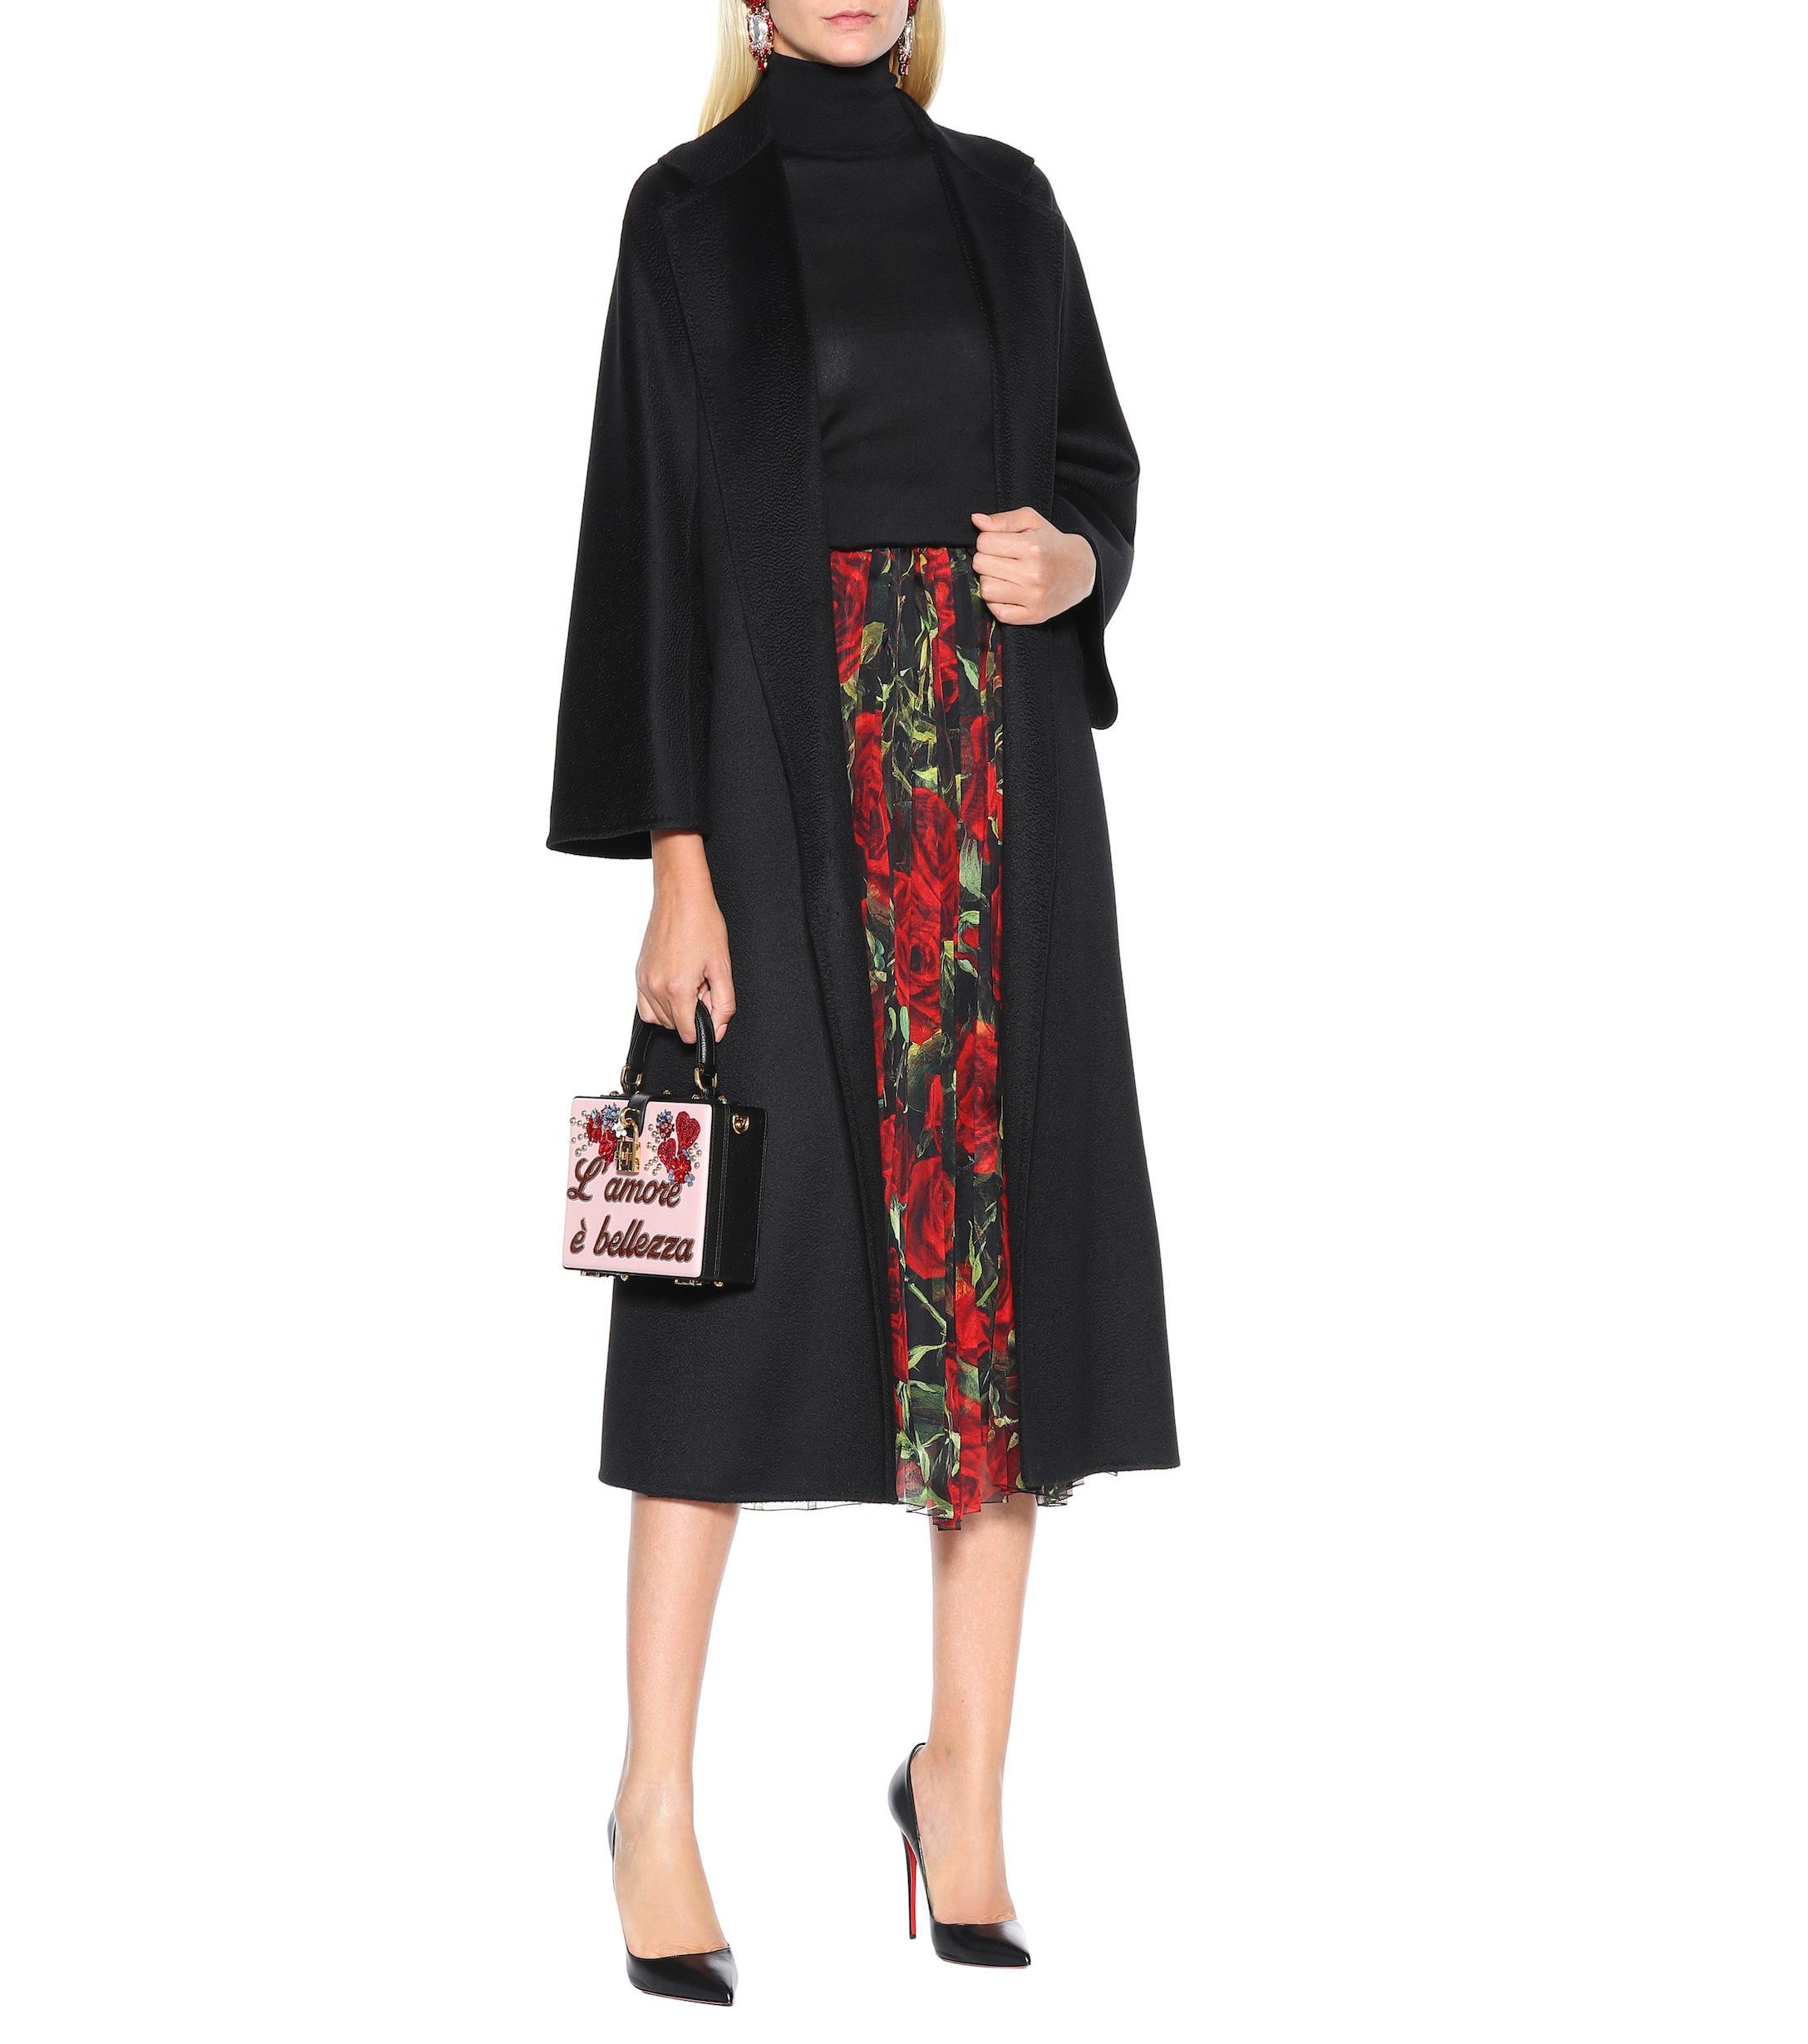 Falda de mezcla de seda floral Dolce & Gabbana de Tejido sintético